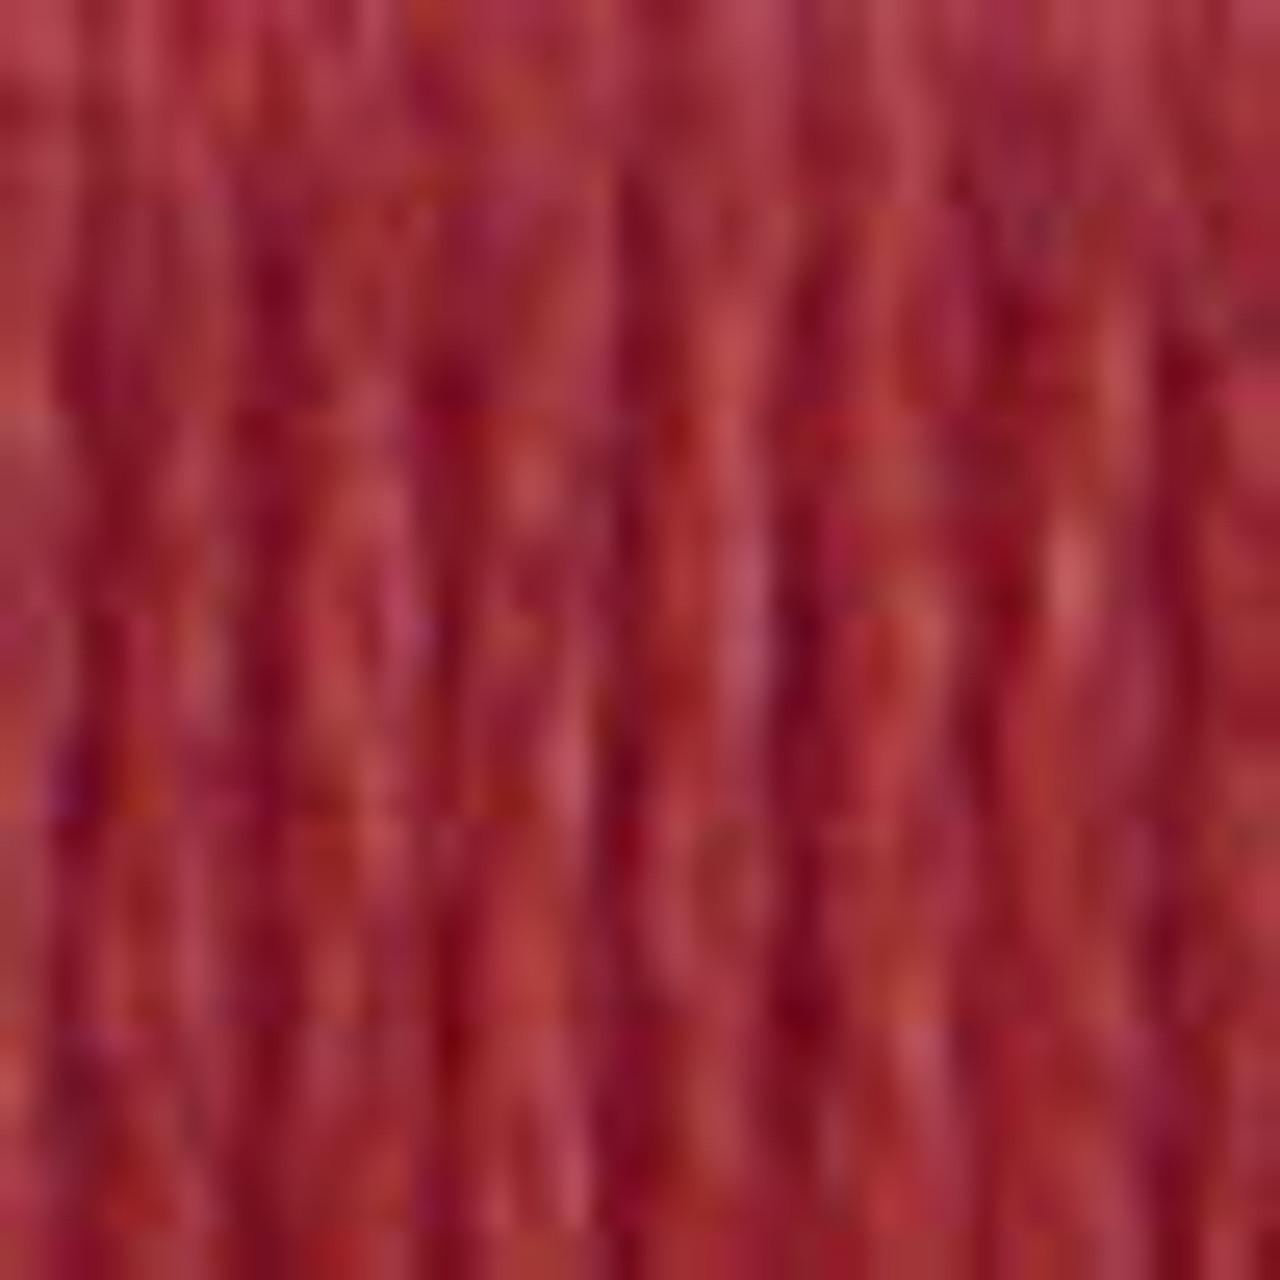 DMC # 3858 Medium Rosewood Floss / Thread